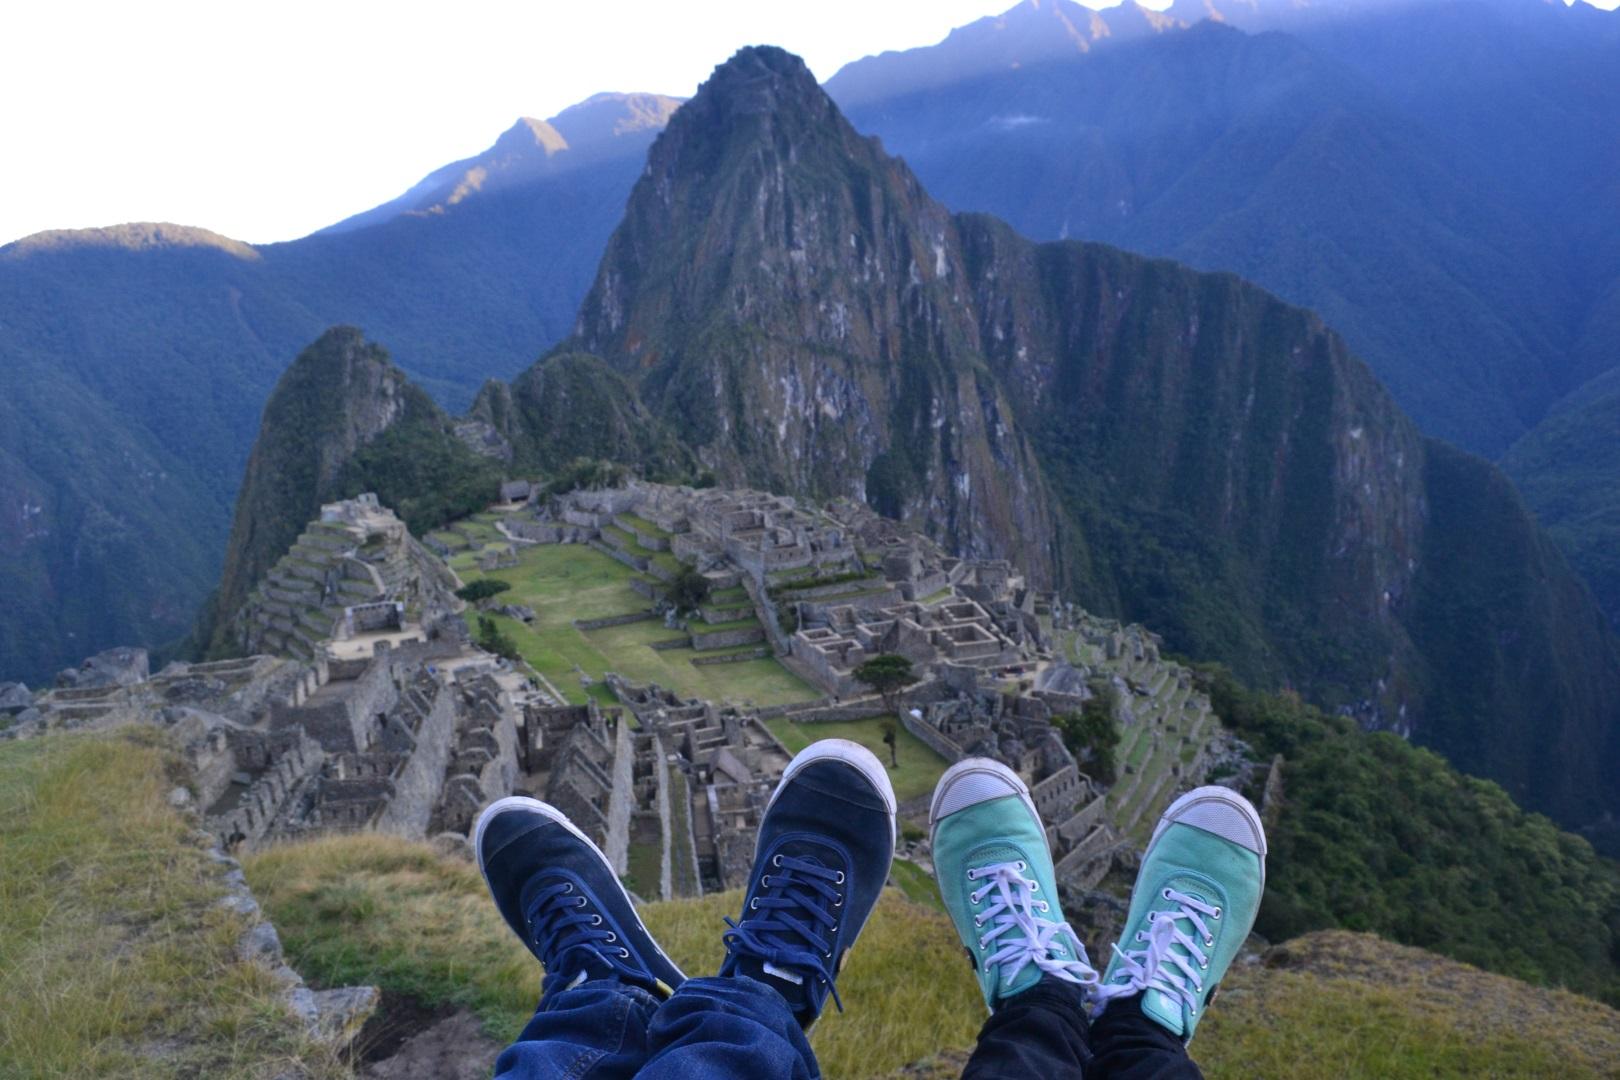 Visiter Machu Picchu - Pérou